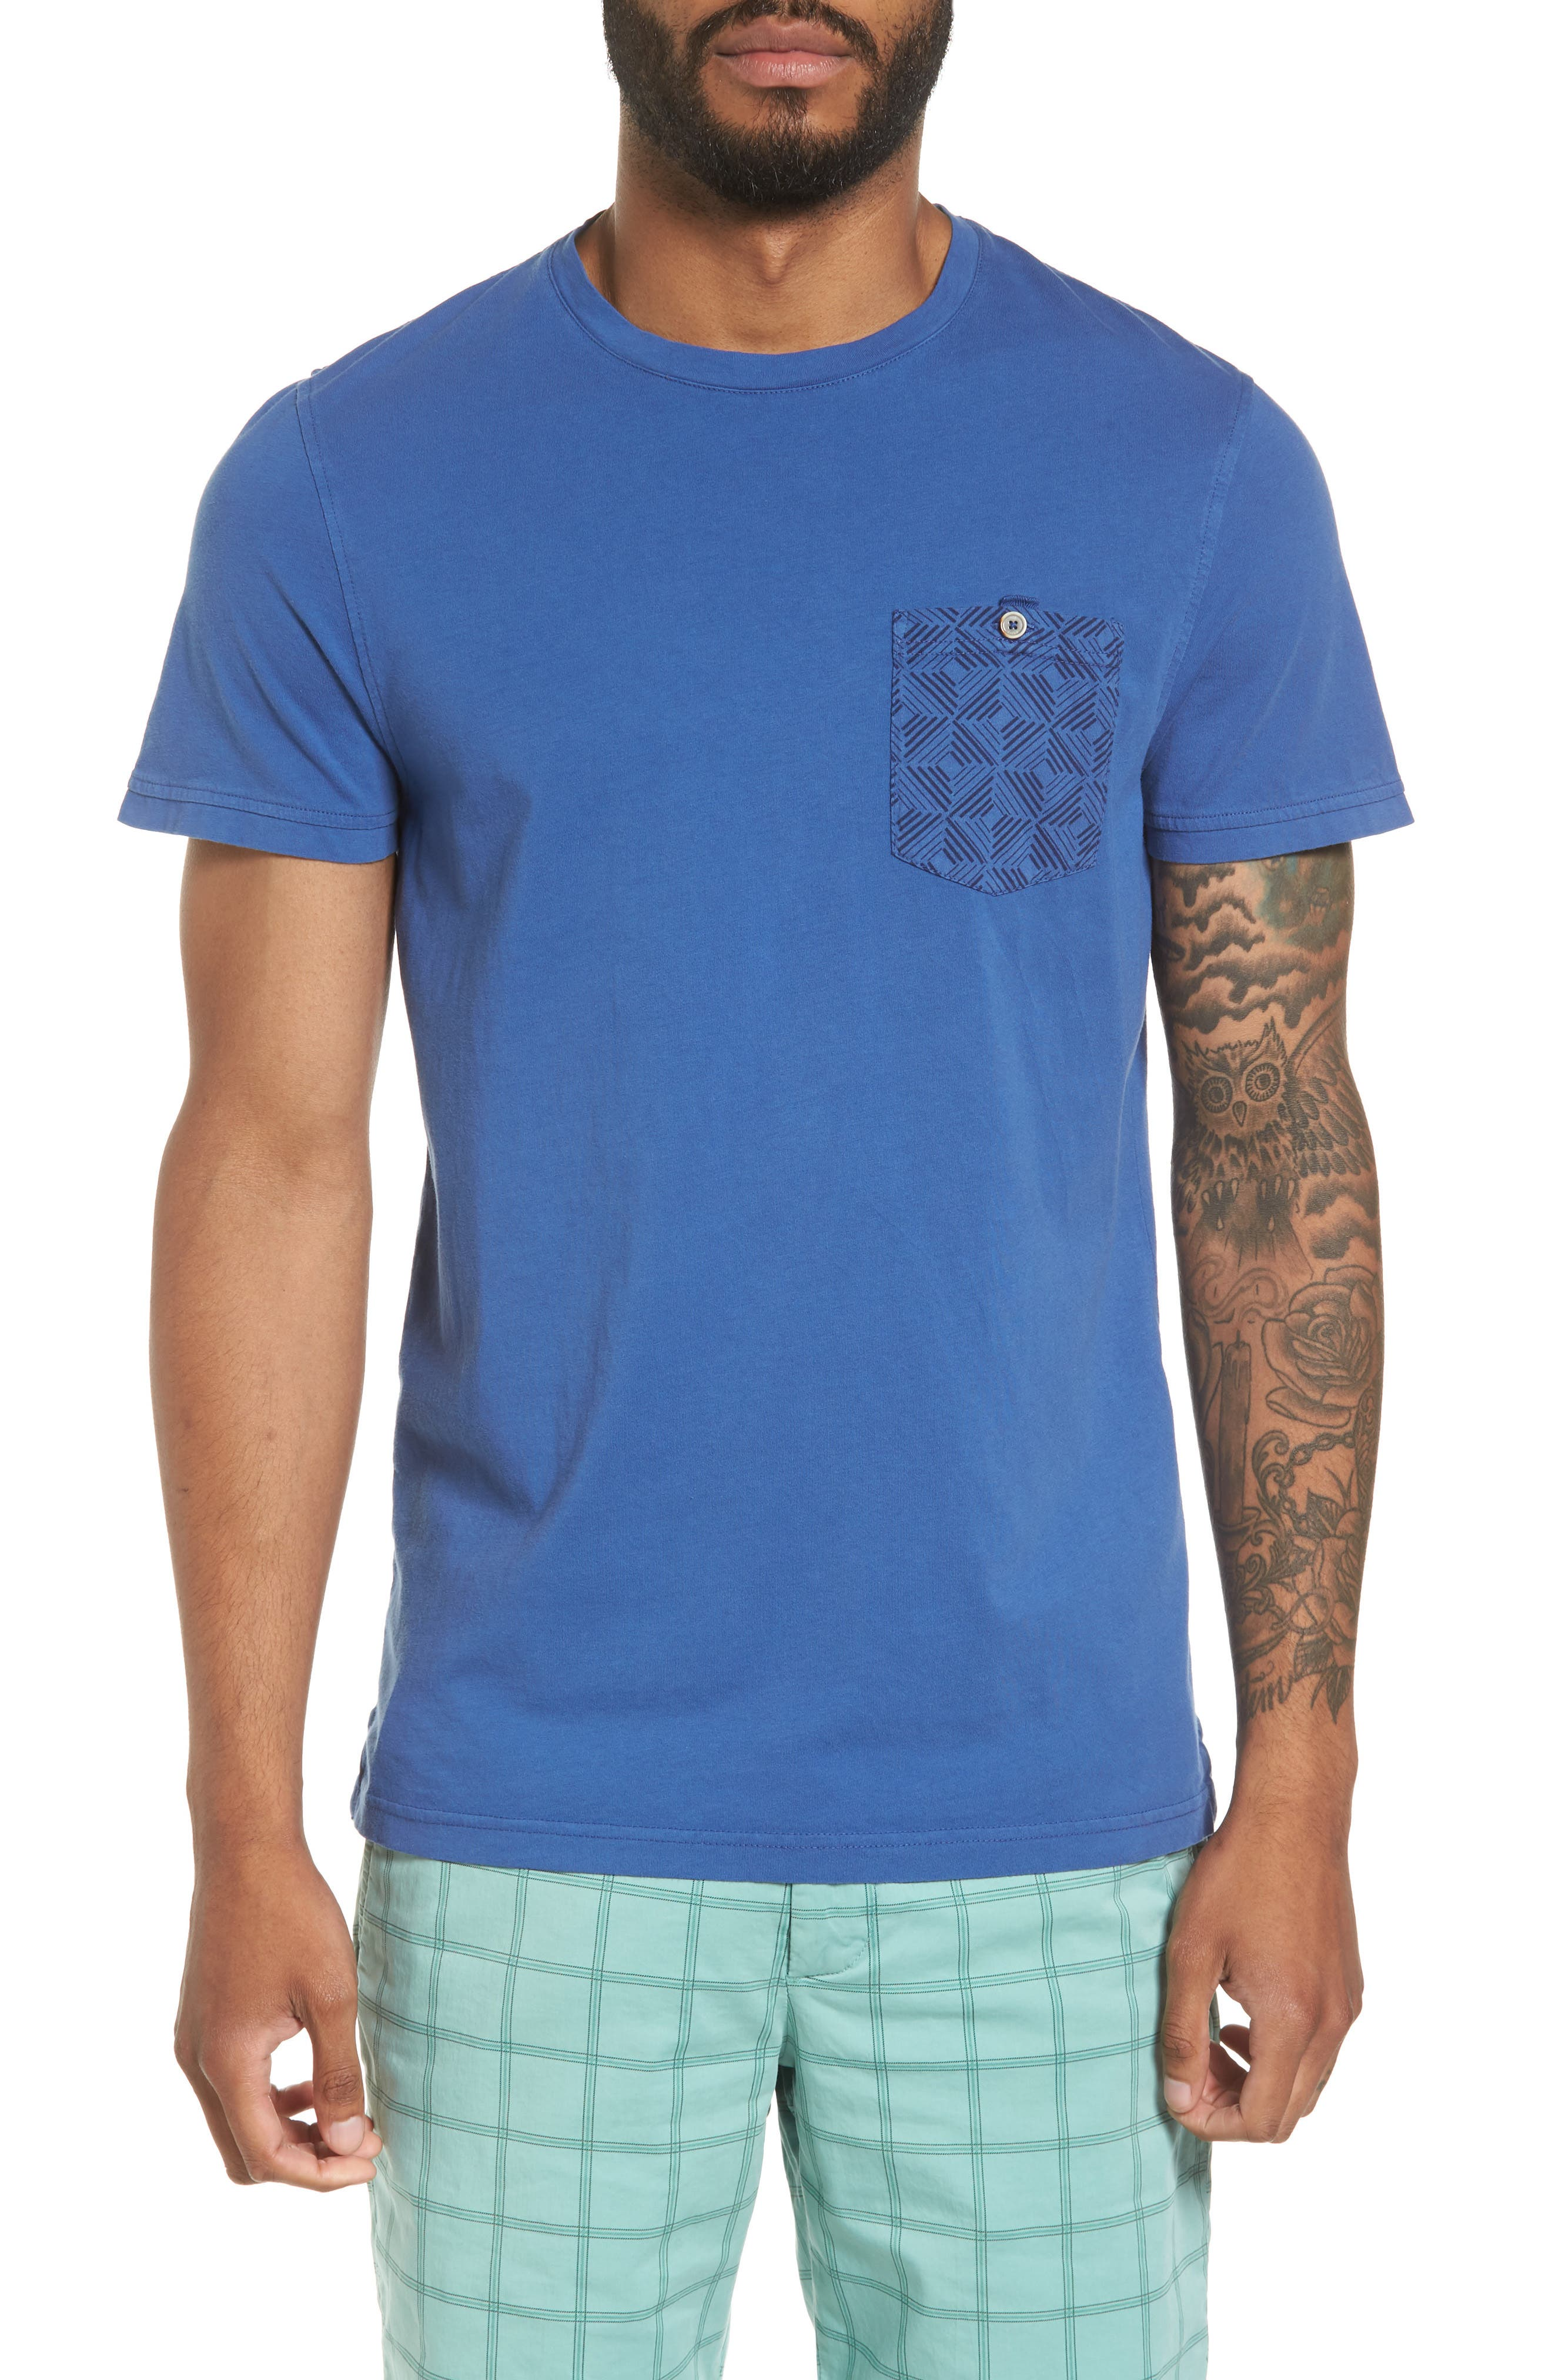 TED BAKER LONDON Bothy Modern Slim Fit T-Shirt